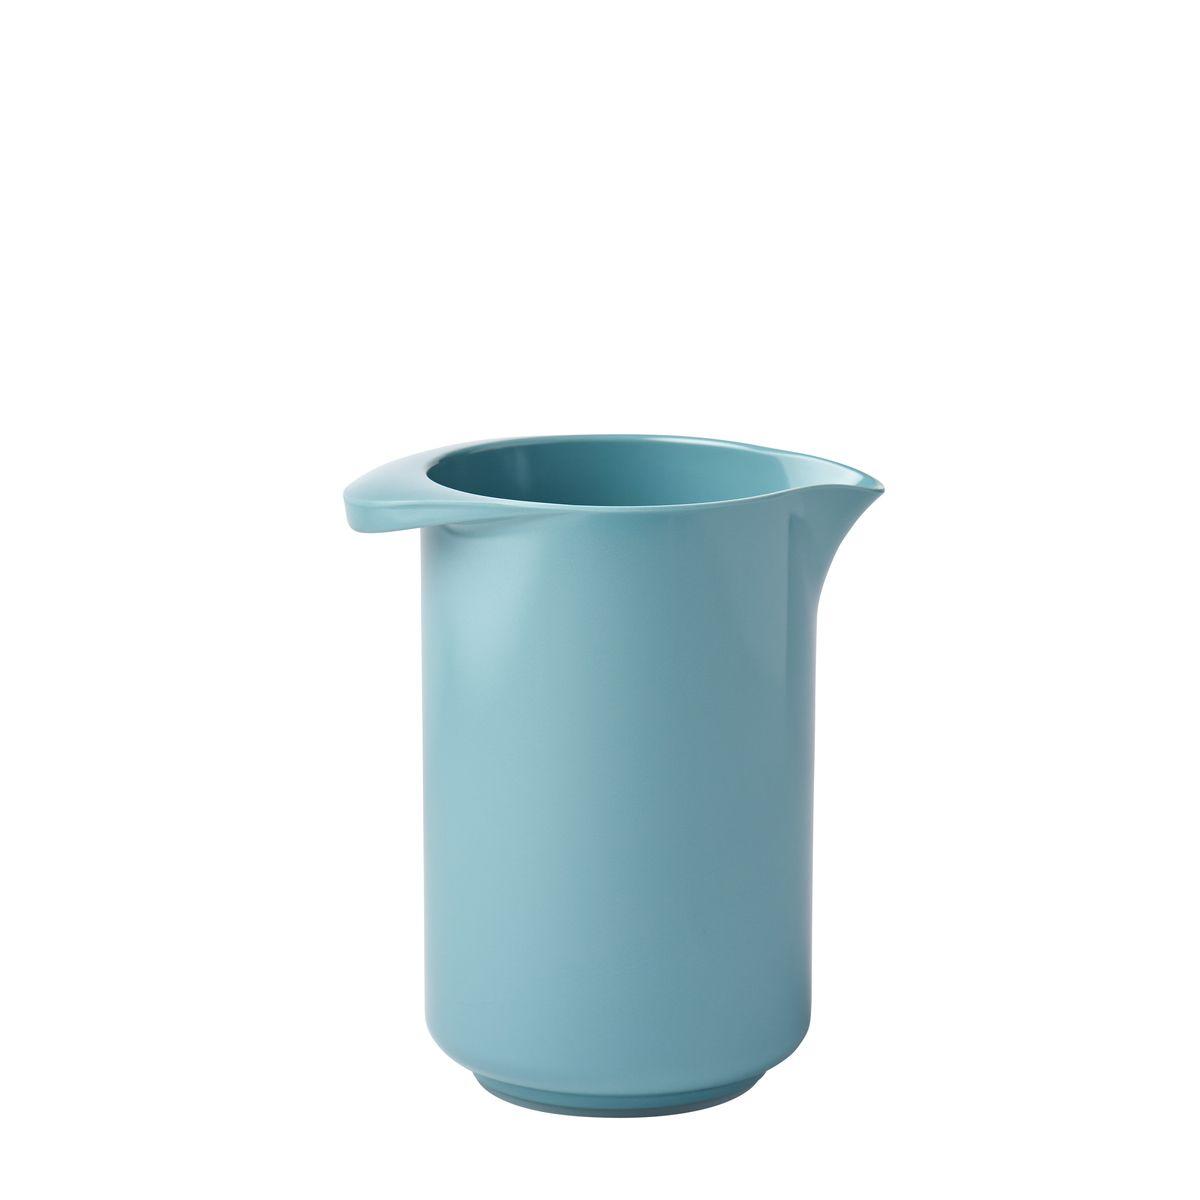 Pichet MargreThé vert menthe 1l - Mepal Rosti